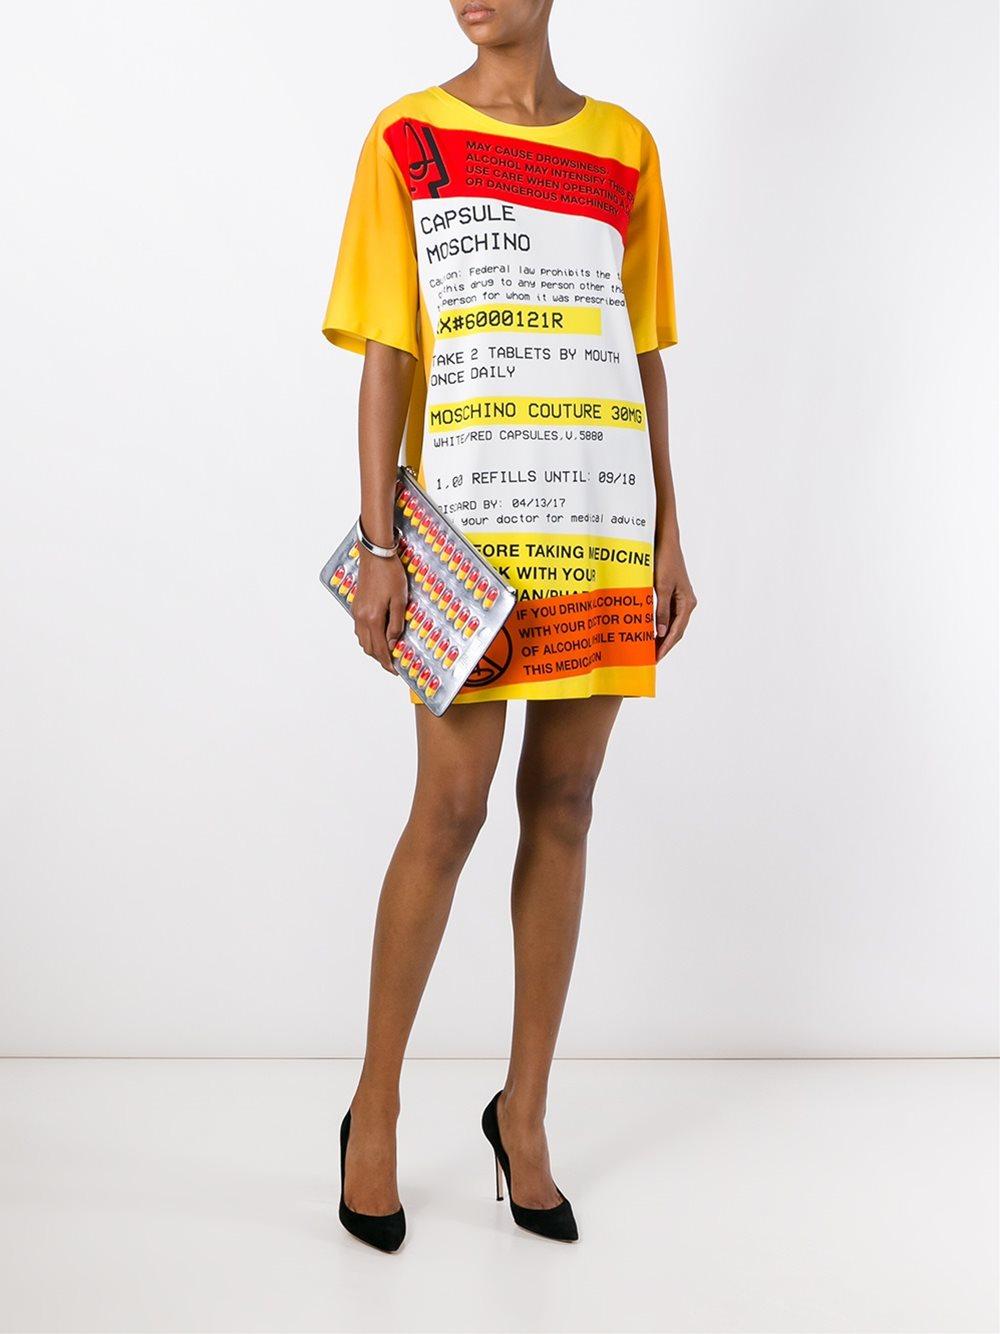 moschino-pill-bag1.jpg